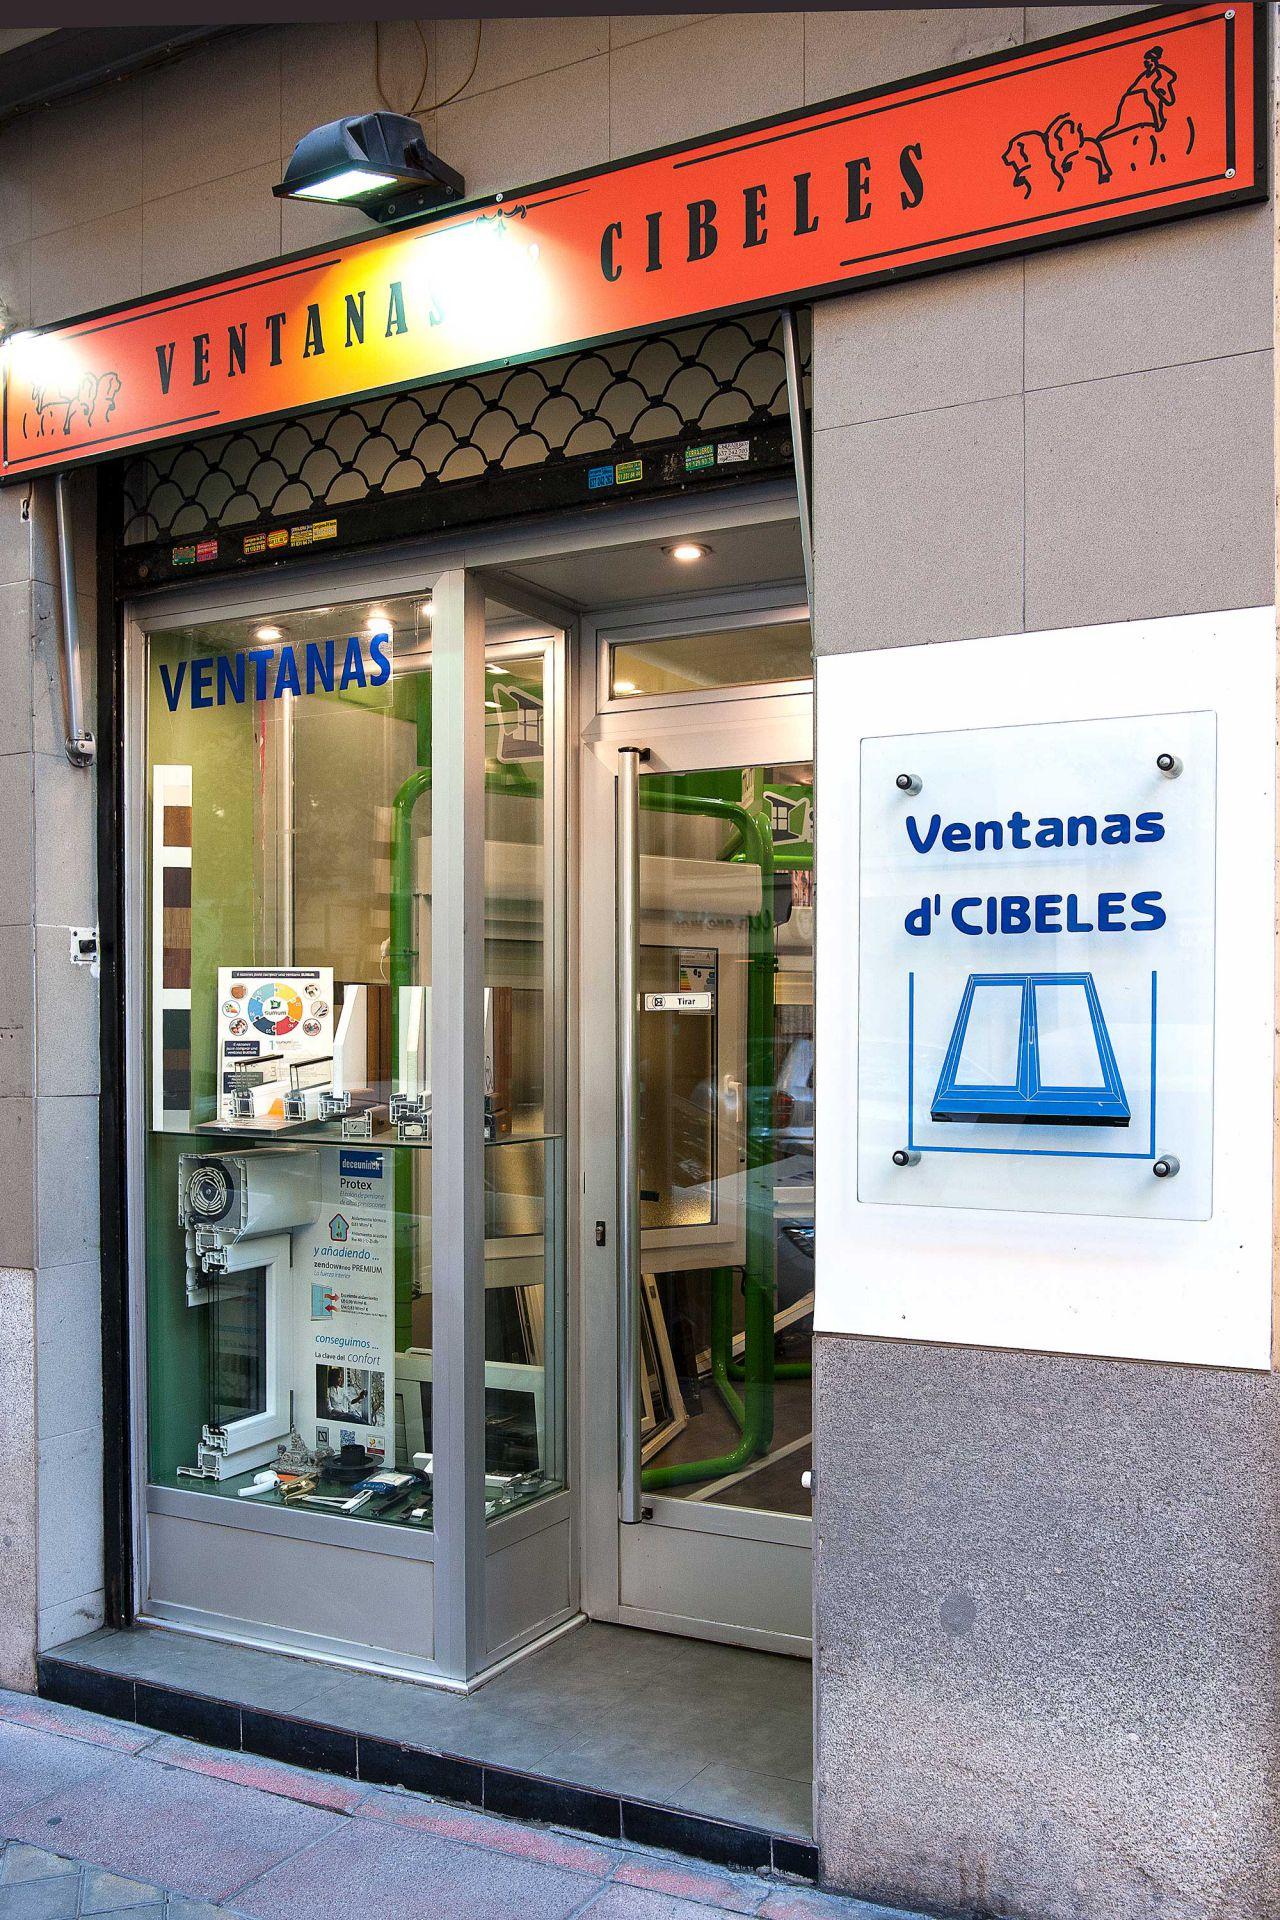 Nº 37. VENTANAS d'CIBELES  Tlf. 914 02 16 32 / 914 02 80 47 www.ventanasdcibeles.com